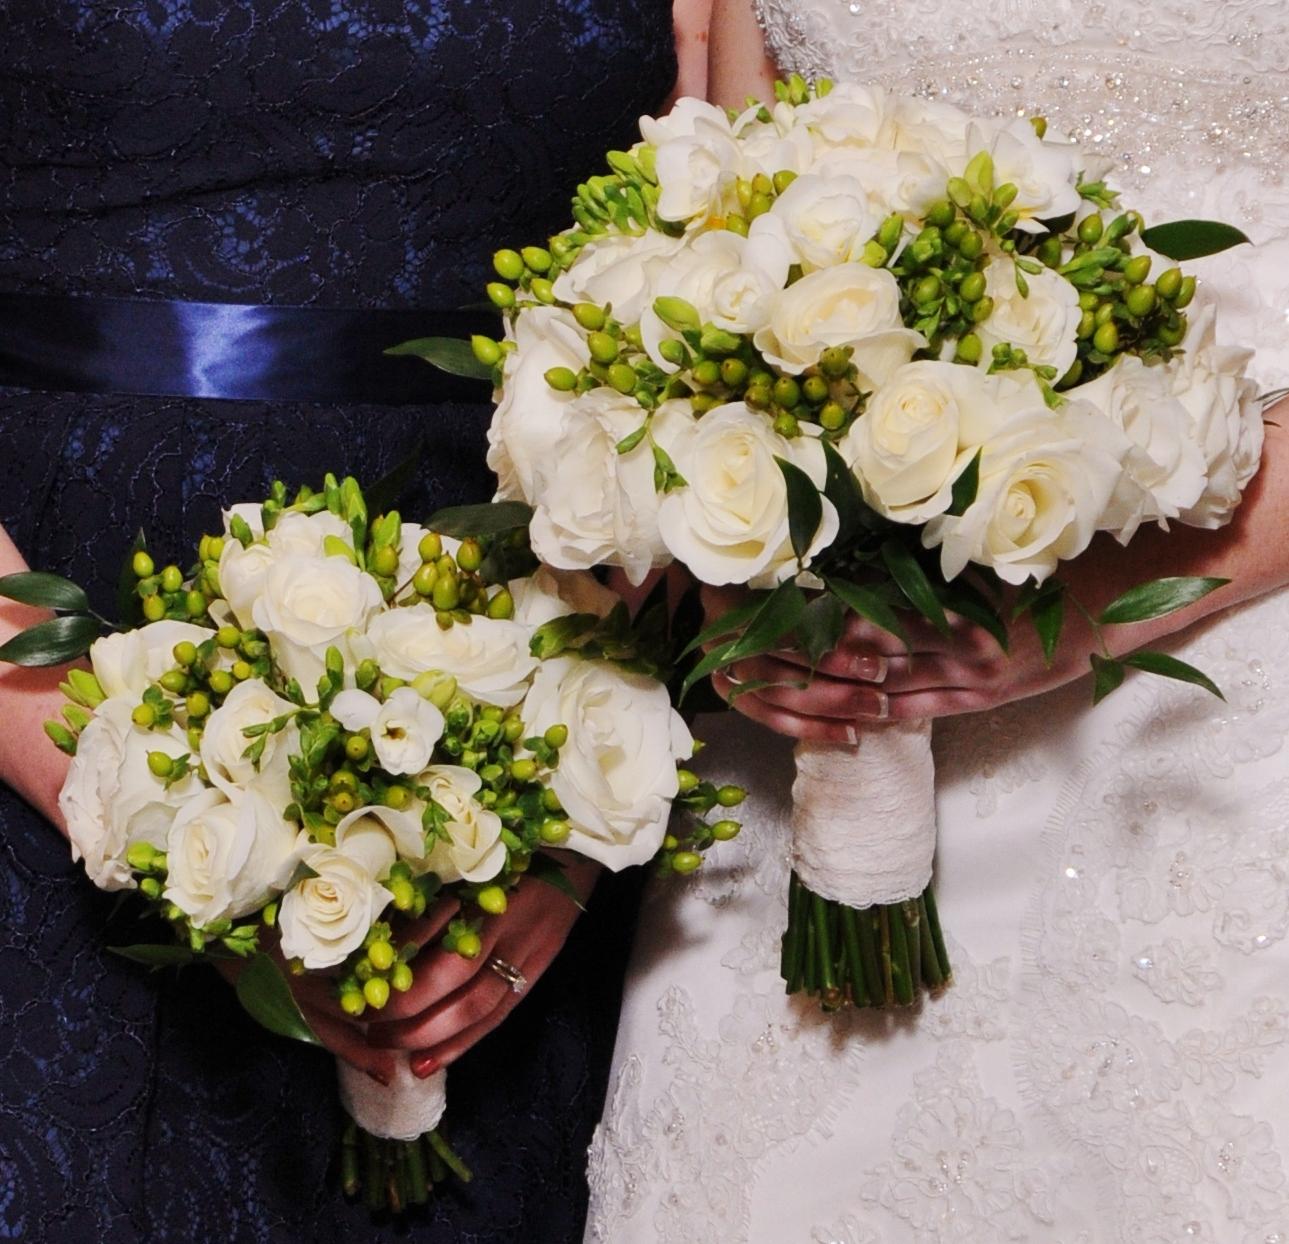 Elegant White Bridal Bouquet : Bonnieprojects elegant white and green wedding bouquets